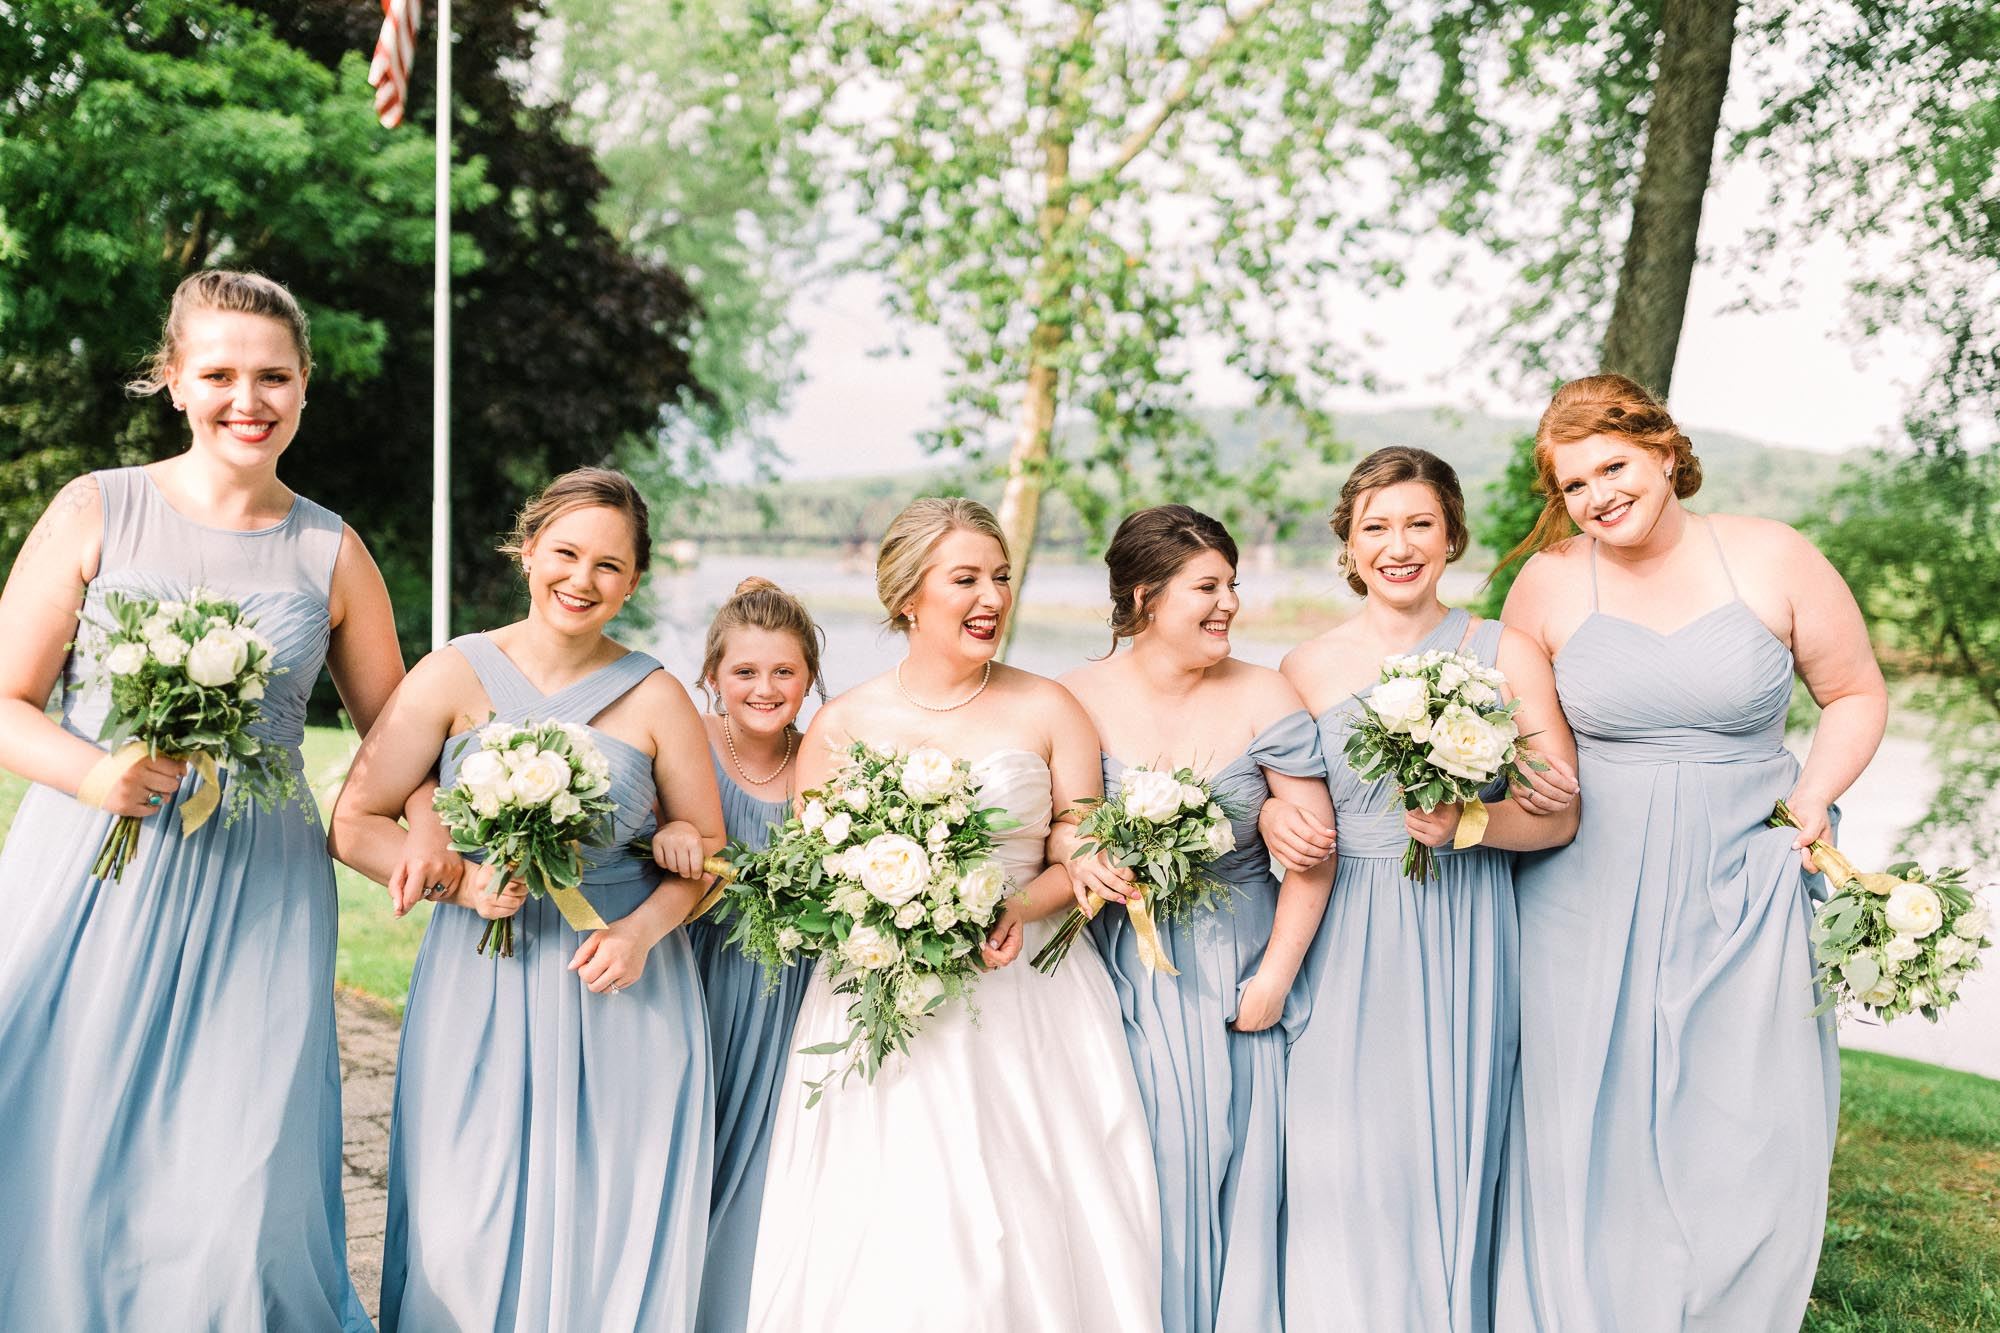 isle-of-que-wedding-6911.jpg